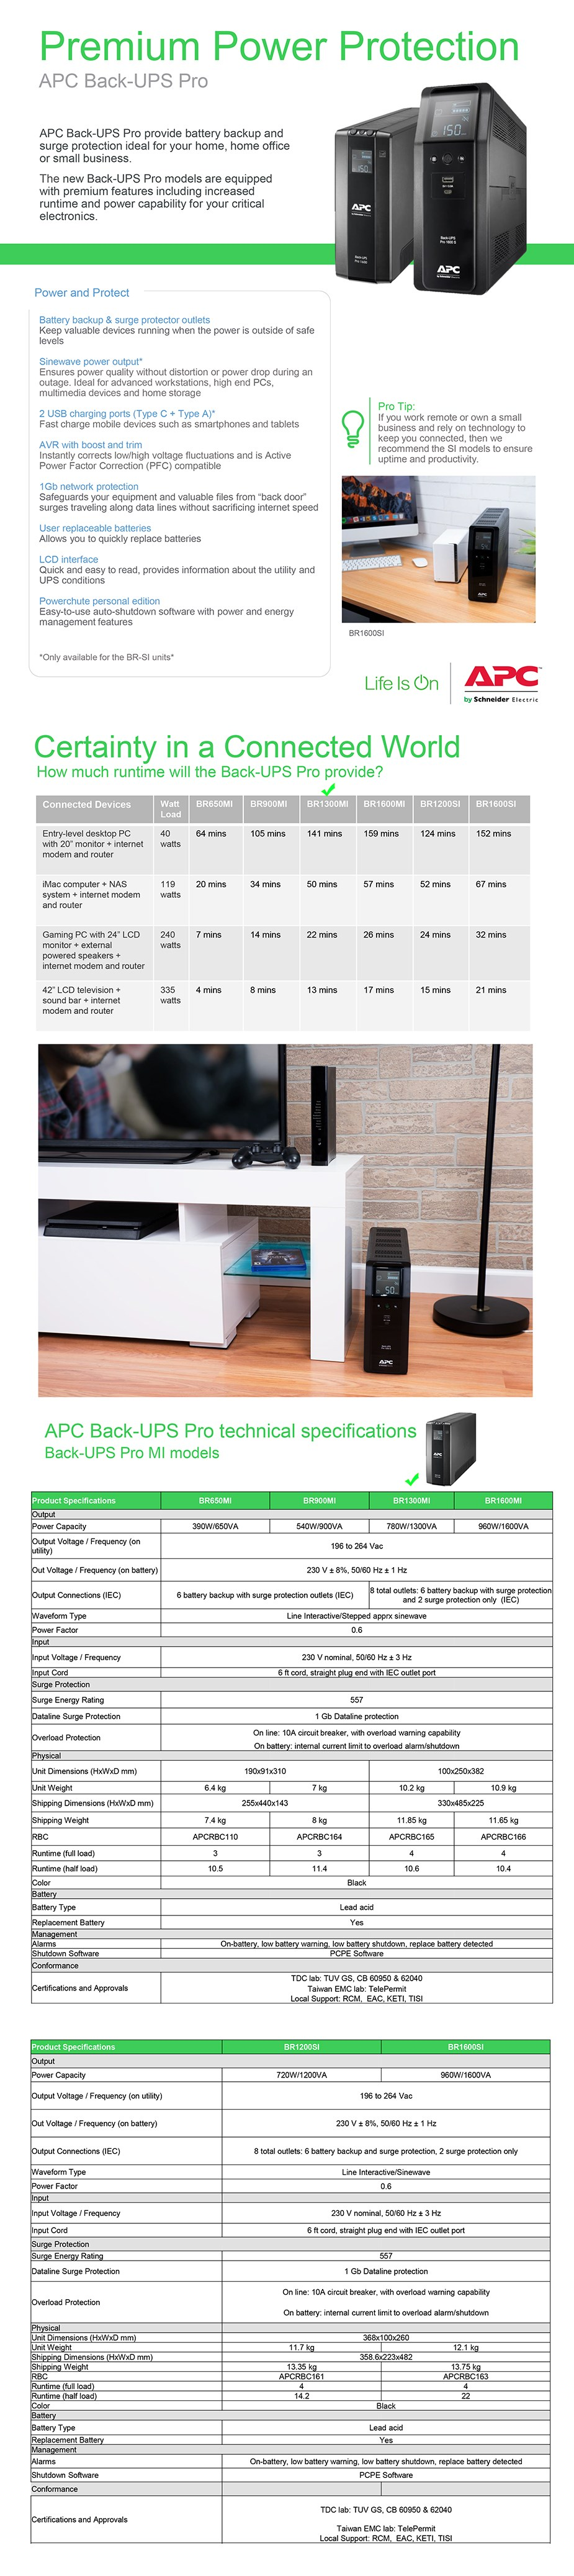 apc-br1300mi-back-ups-pro-br-1300va780w-line-interactive-ups-ac33520-5.jpg